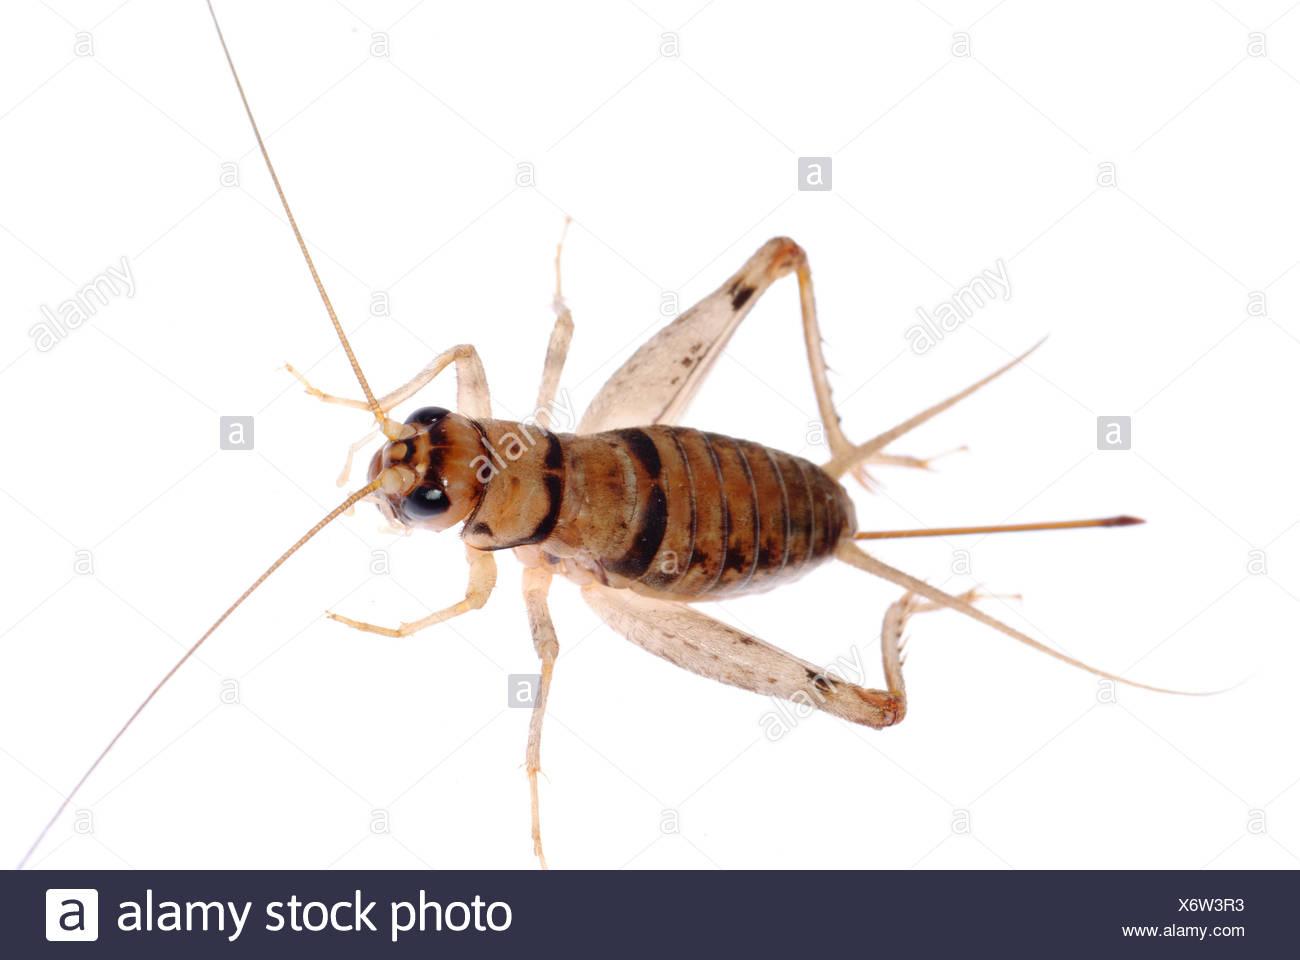 insecto grillo Imagen De Stock